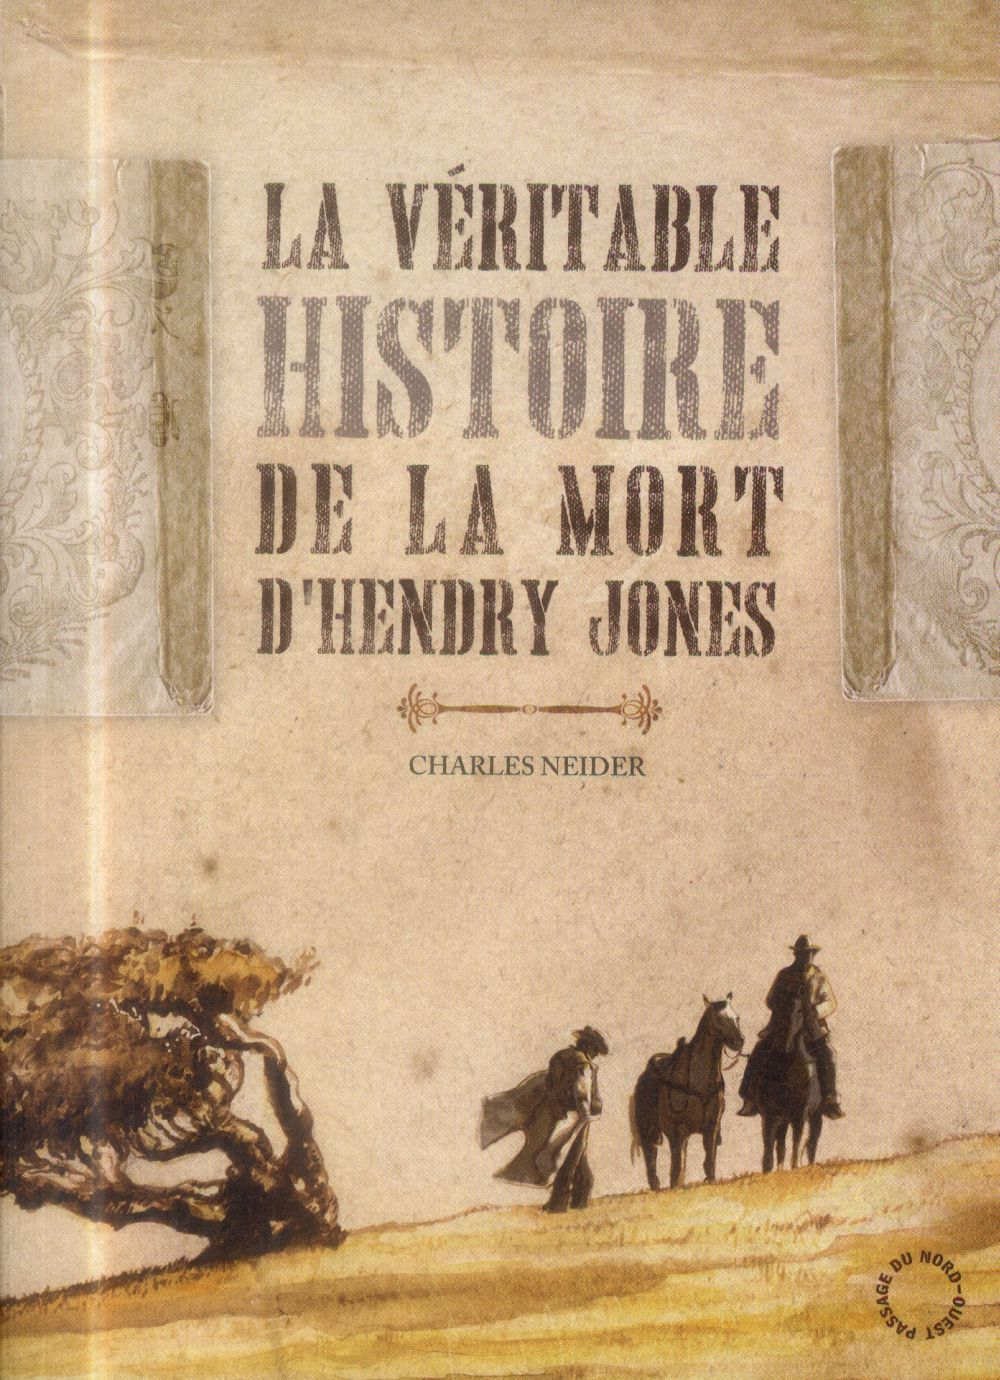 La véritable histoire de la mort d'Hendry Jones